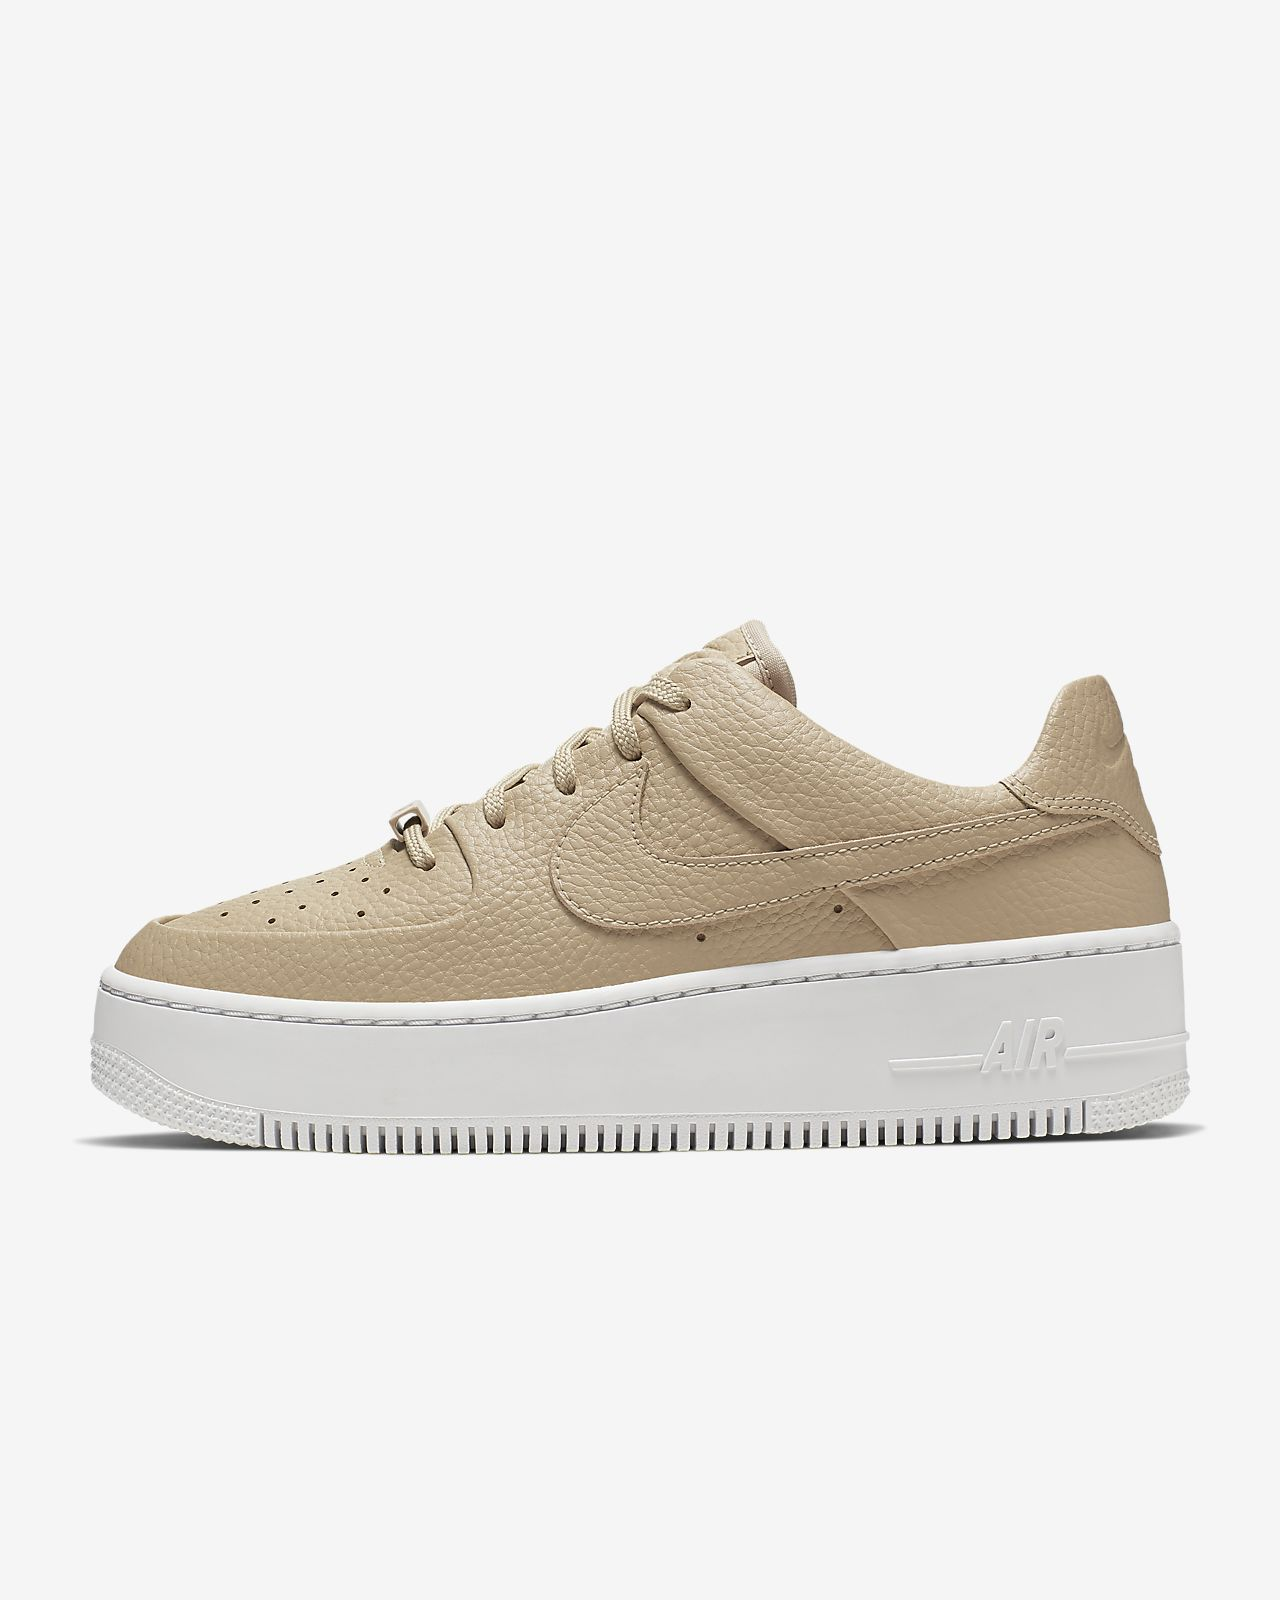 Sapatilhas casual de mulher Air Force 1 Sage Low Nike